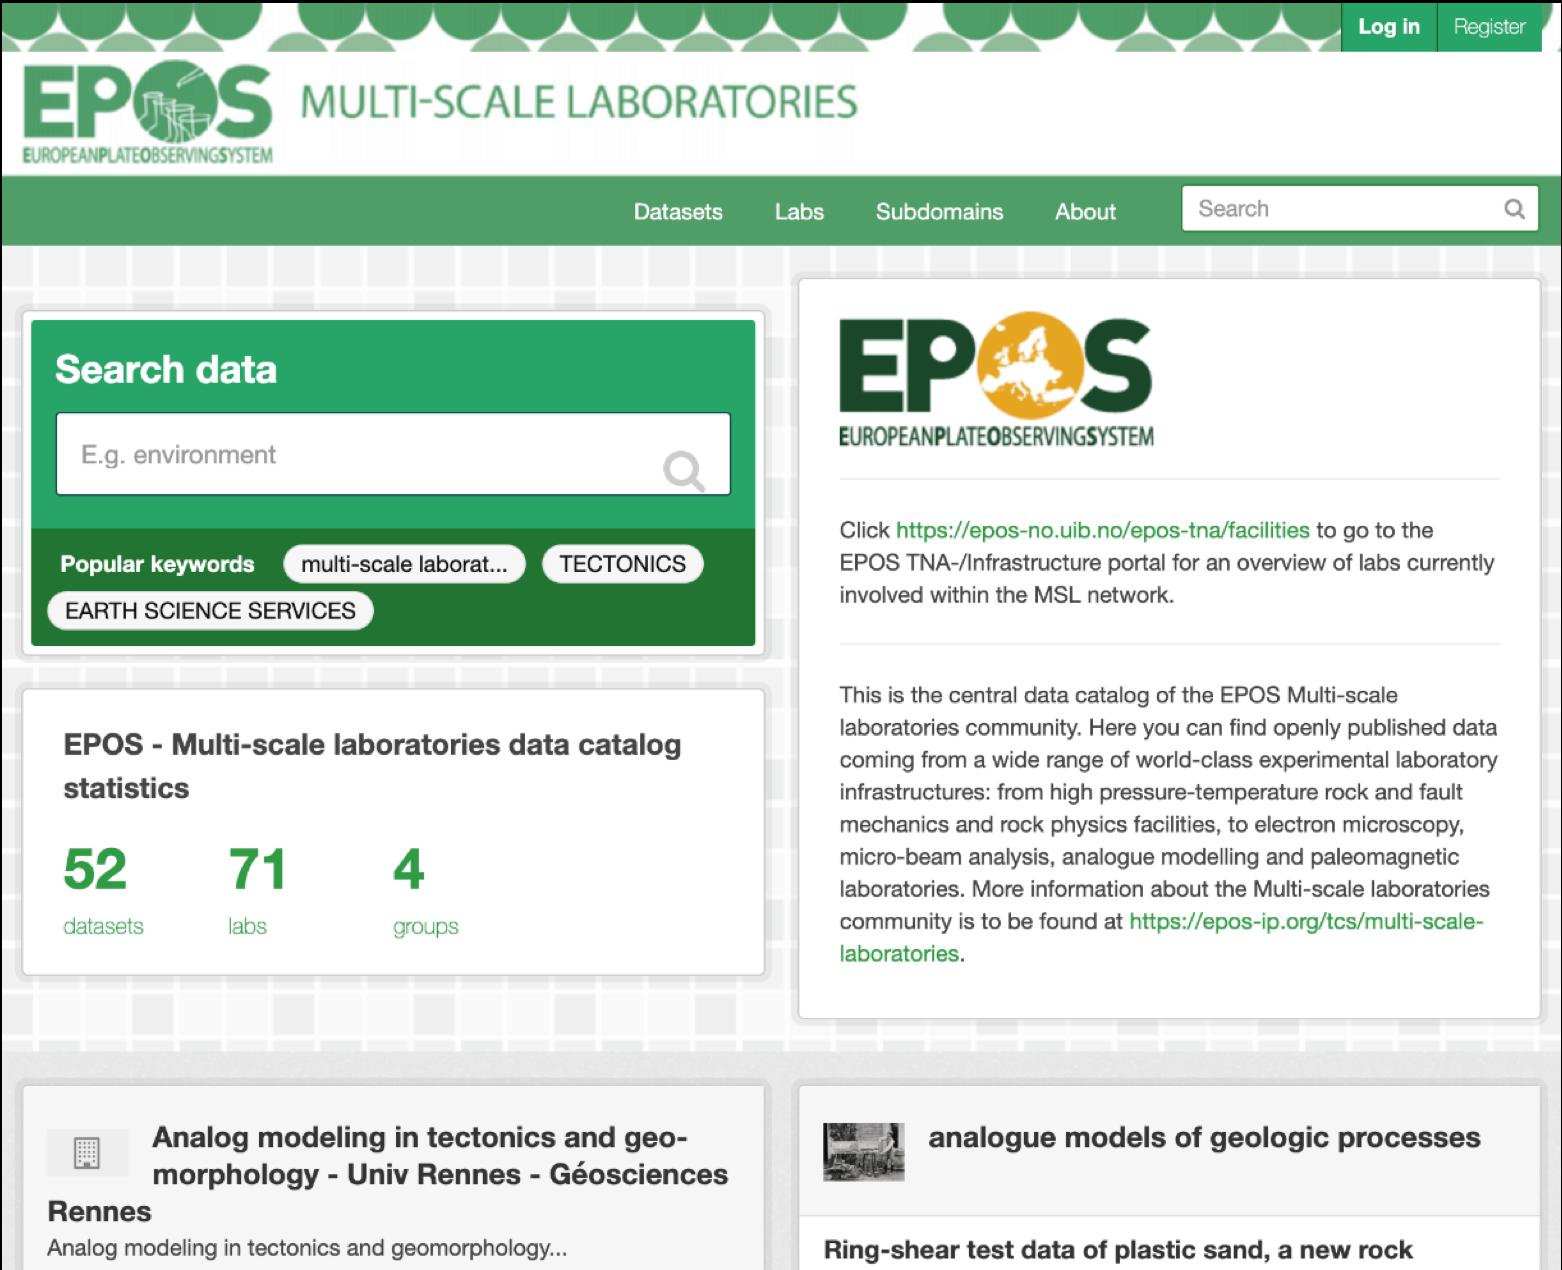 The TCS Portal (catalogue service) - https://epos-msl.uu.nl/